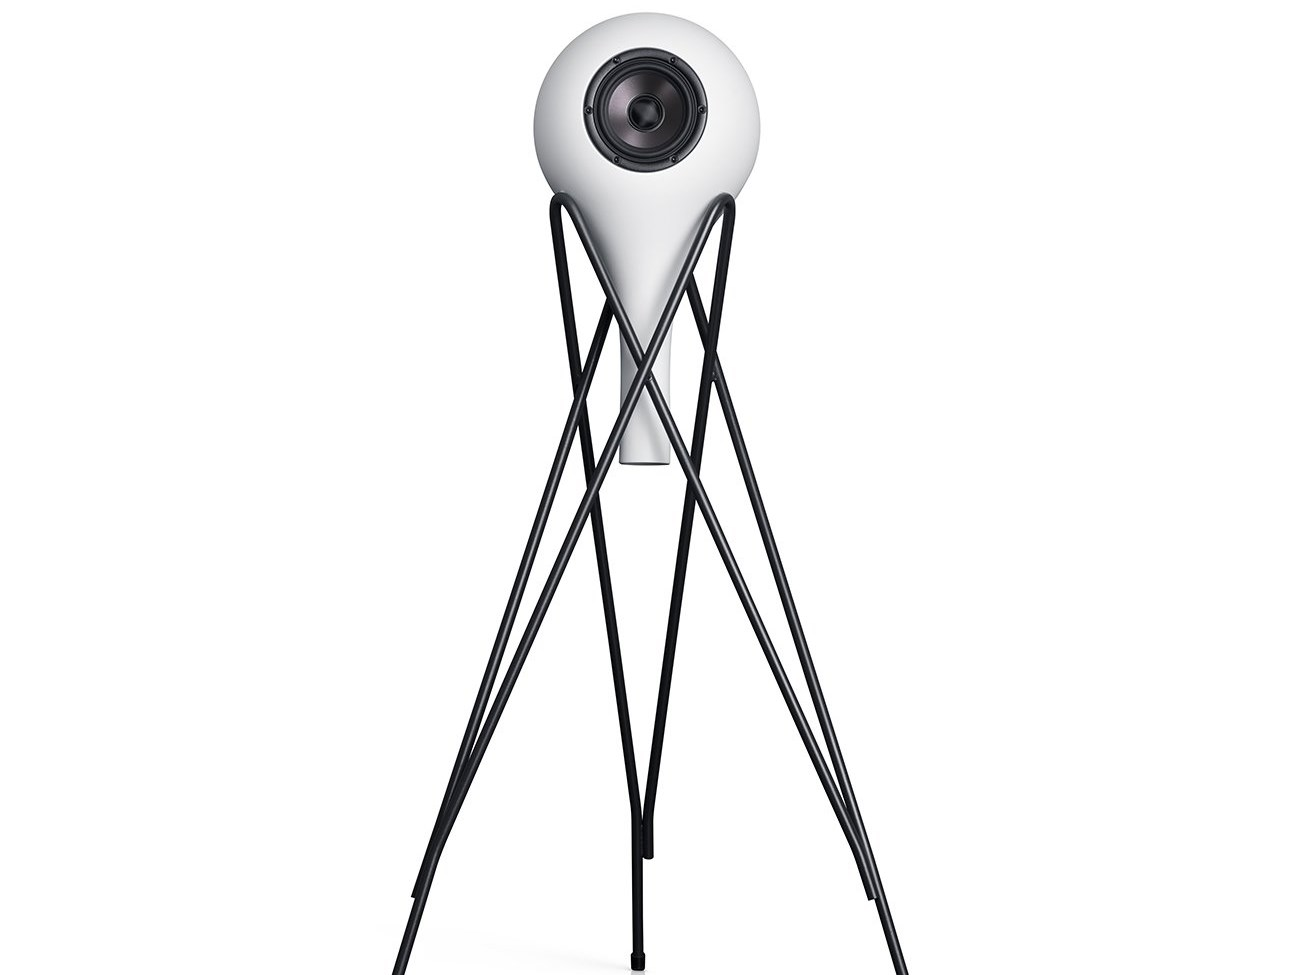 Design speakers Teufel X Rosenthal